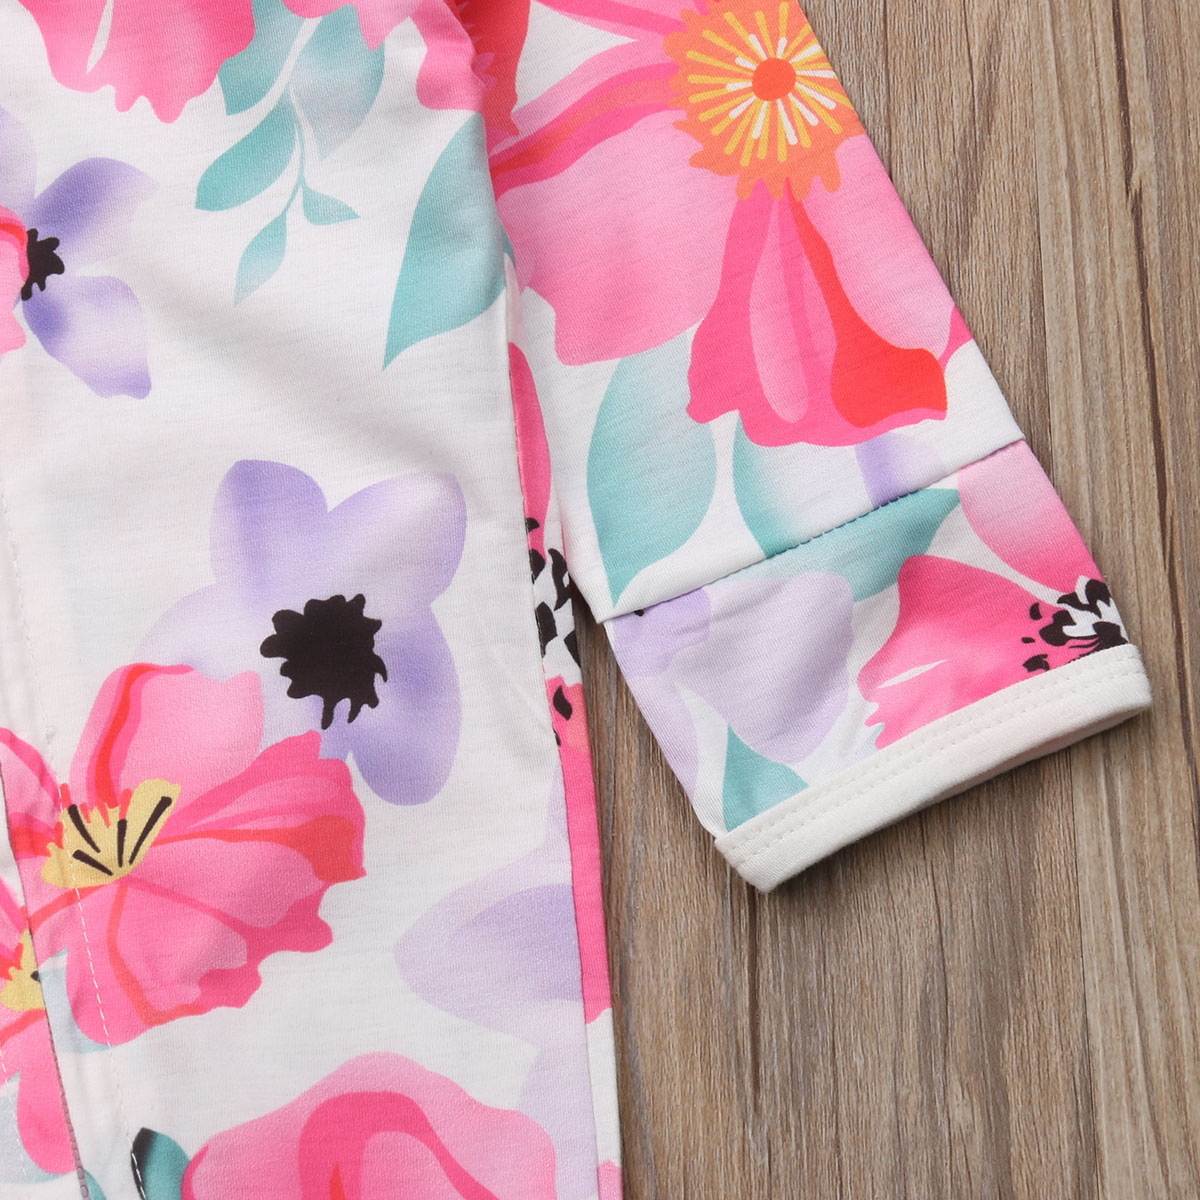 Pudcoco Girl Jumpsuits 0-24M US Flower Newborn Baby Girl Zipper Cotton Romper Jumpsuit Autumn Outfits Clothes